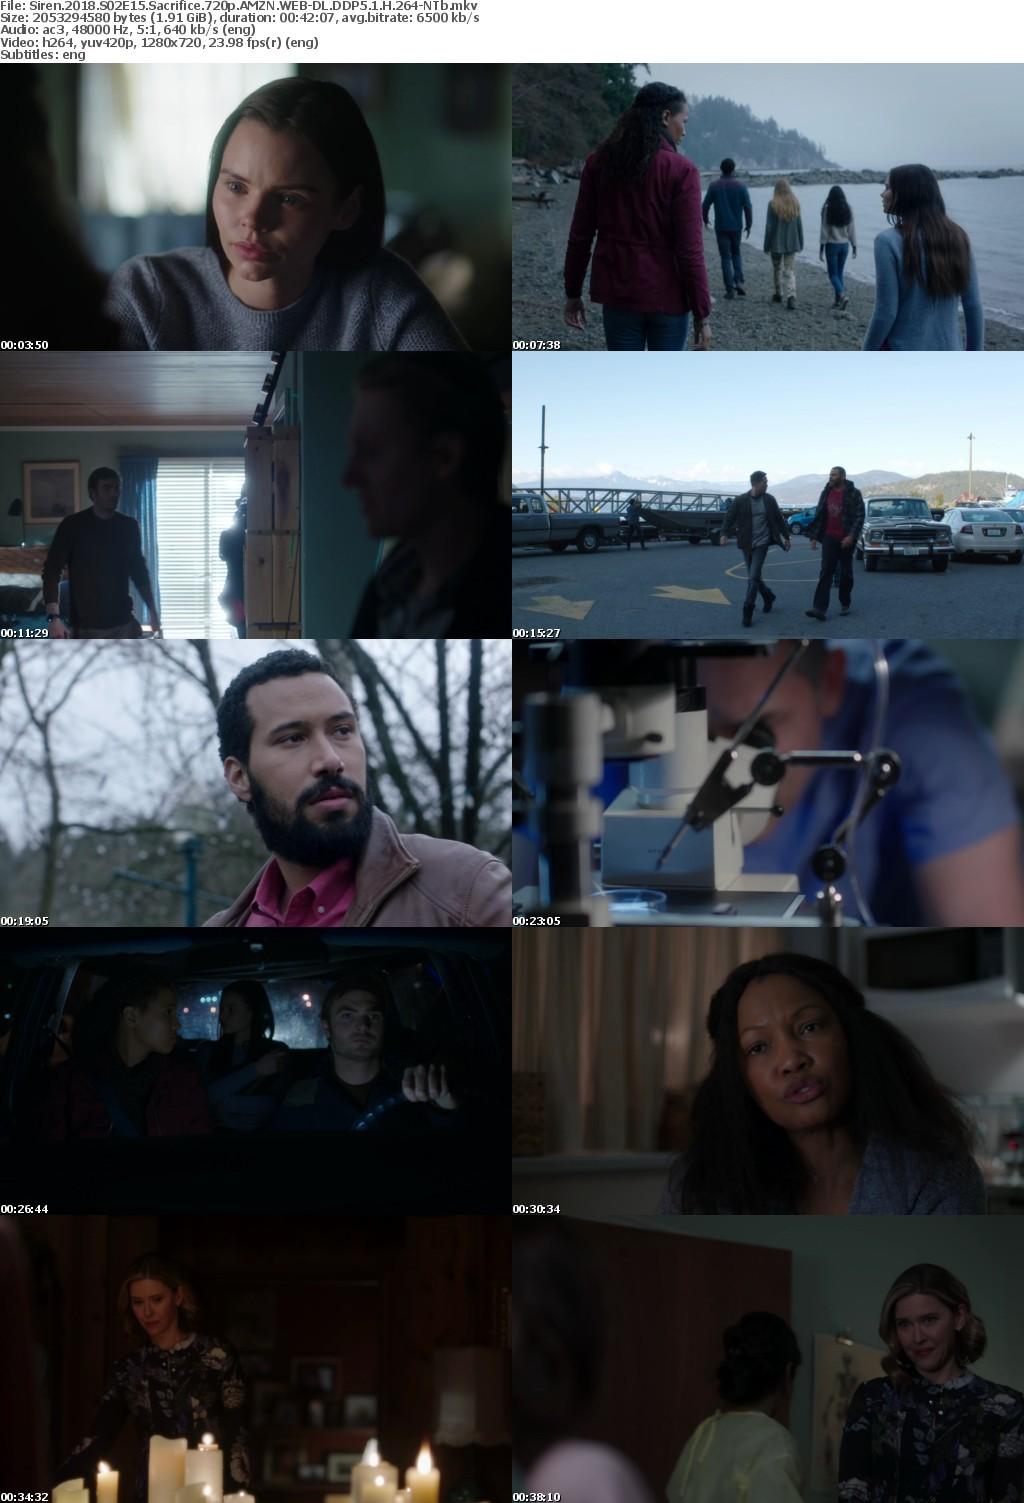 Siren 2018 S02E15 Sacrifice 720p AMZN WEB-DL DDP5 1 H 264-NTb